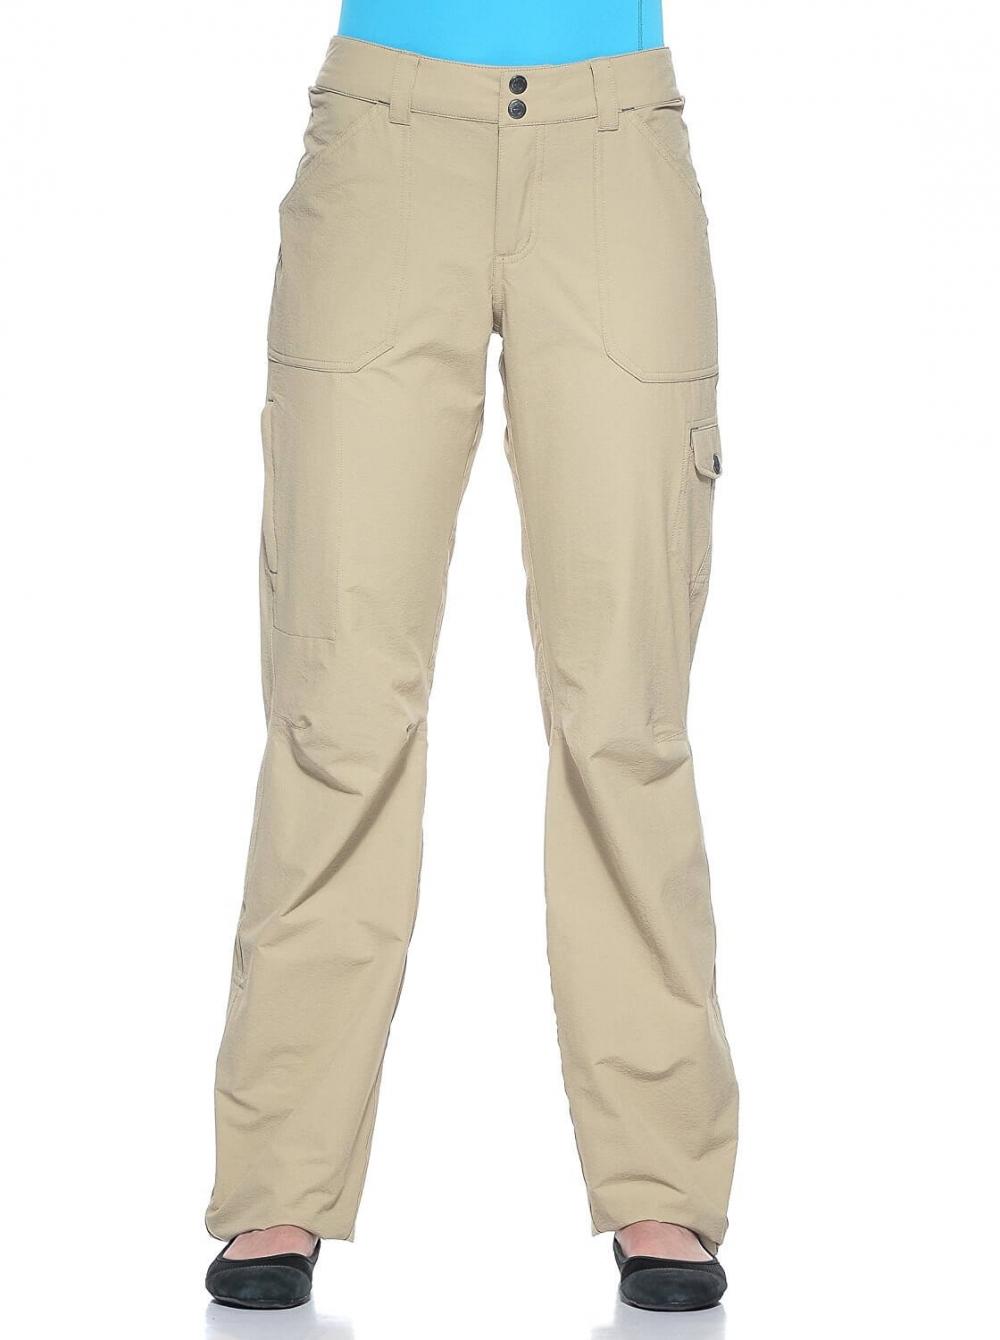 Штаны PATAGONIA nomader pants lady (размер 6-S/M) - 1